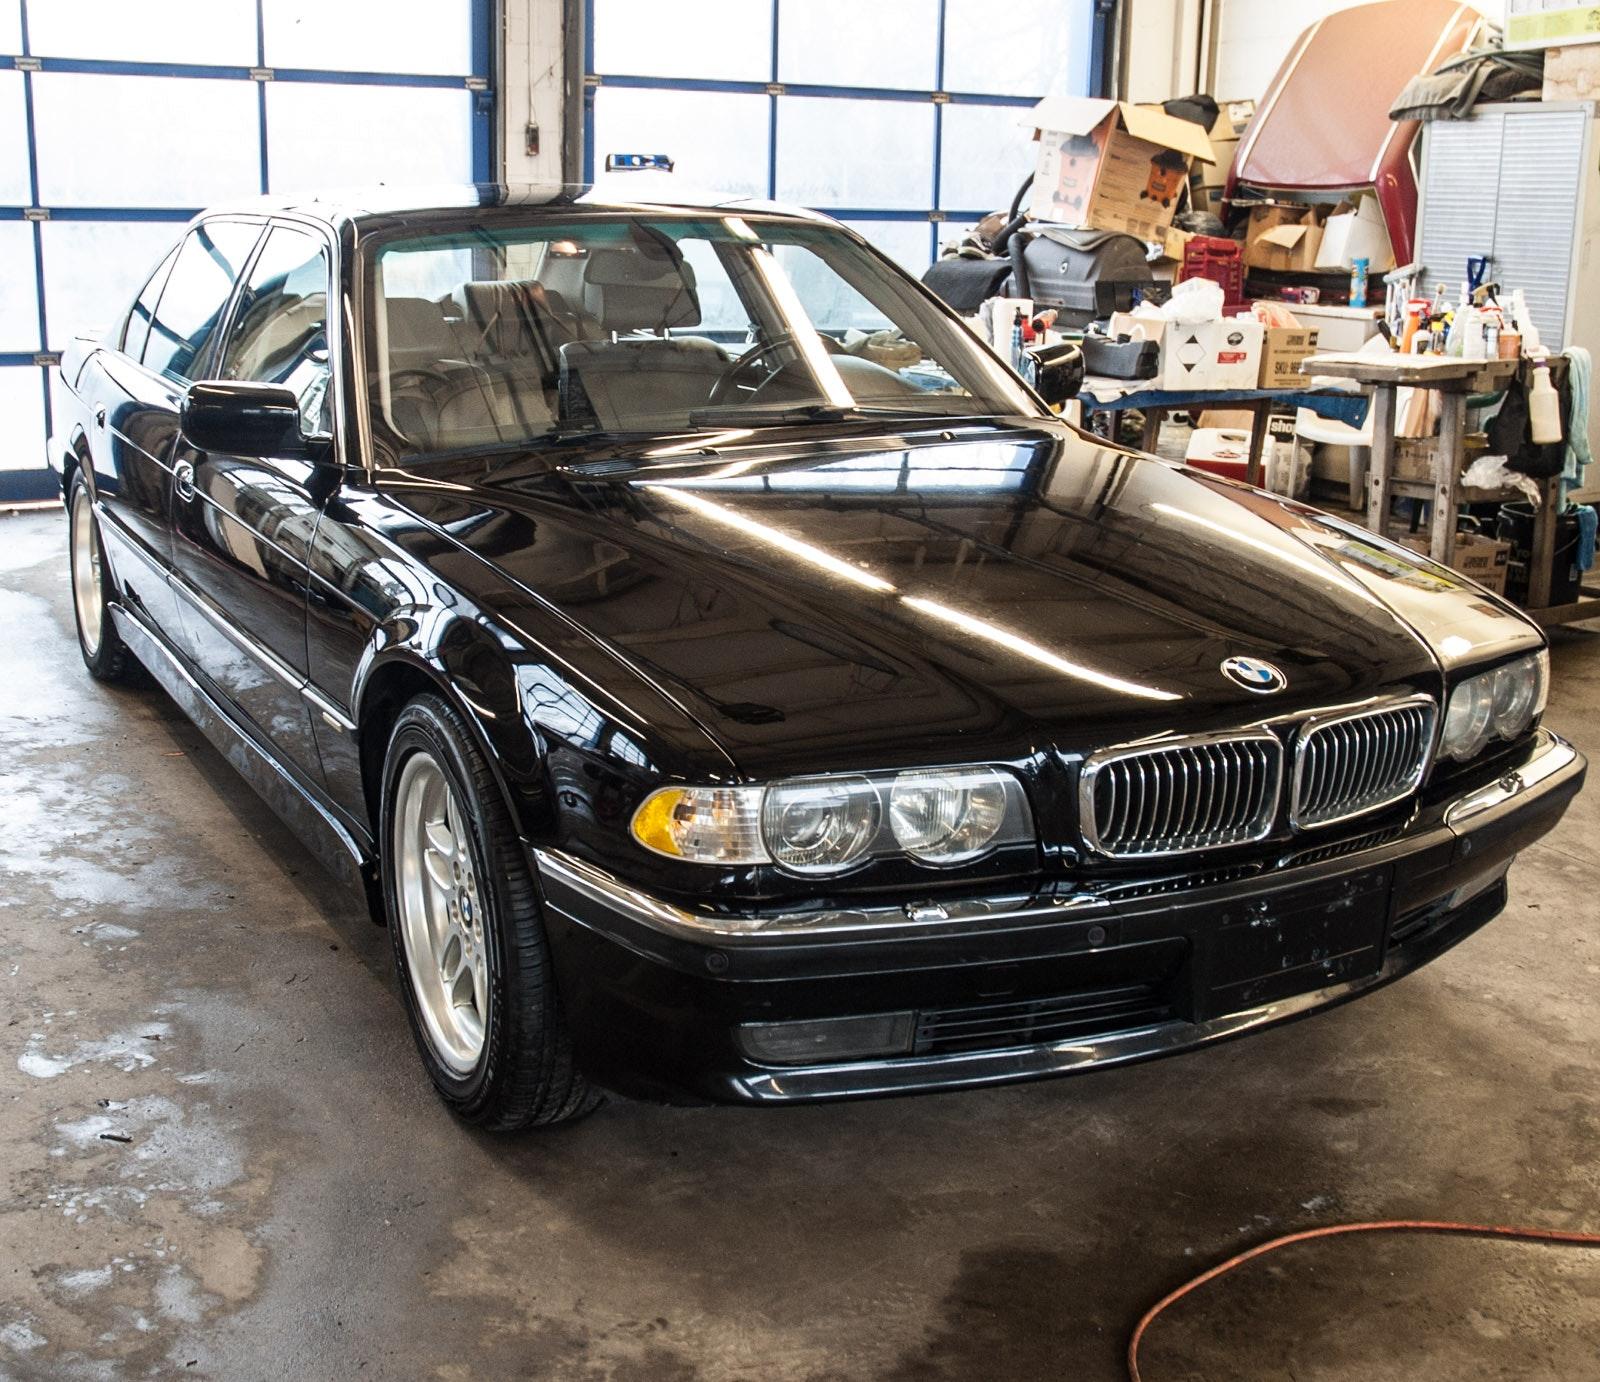 2000 BMW 750IL V12 Sedan